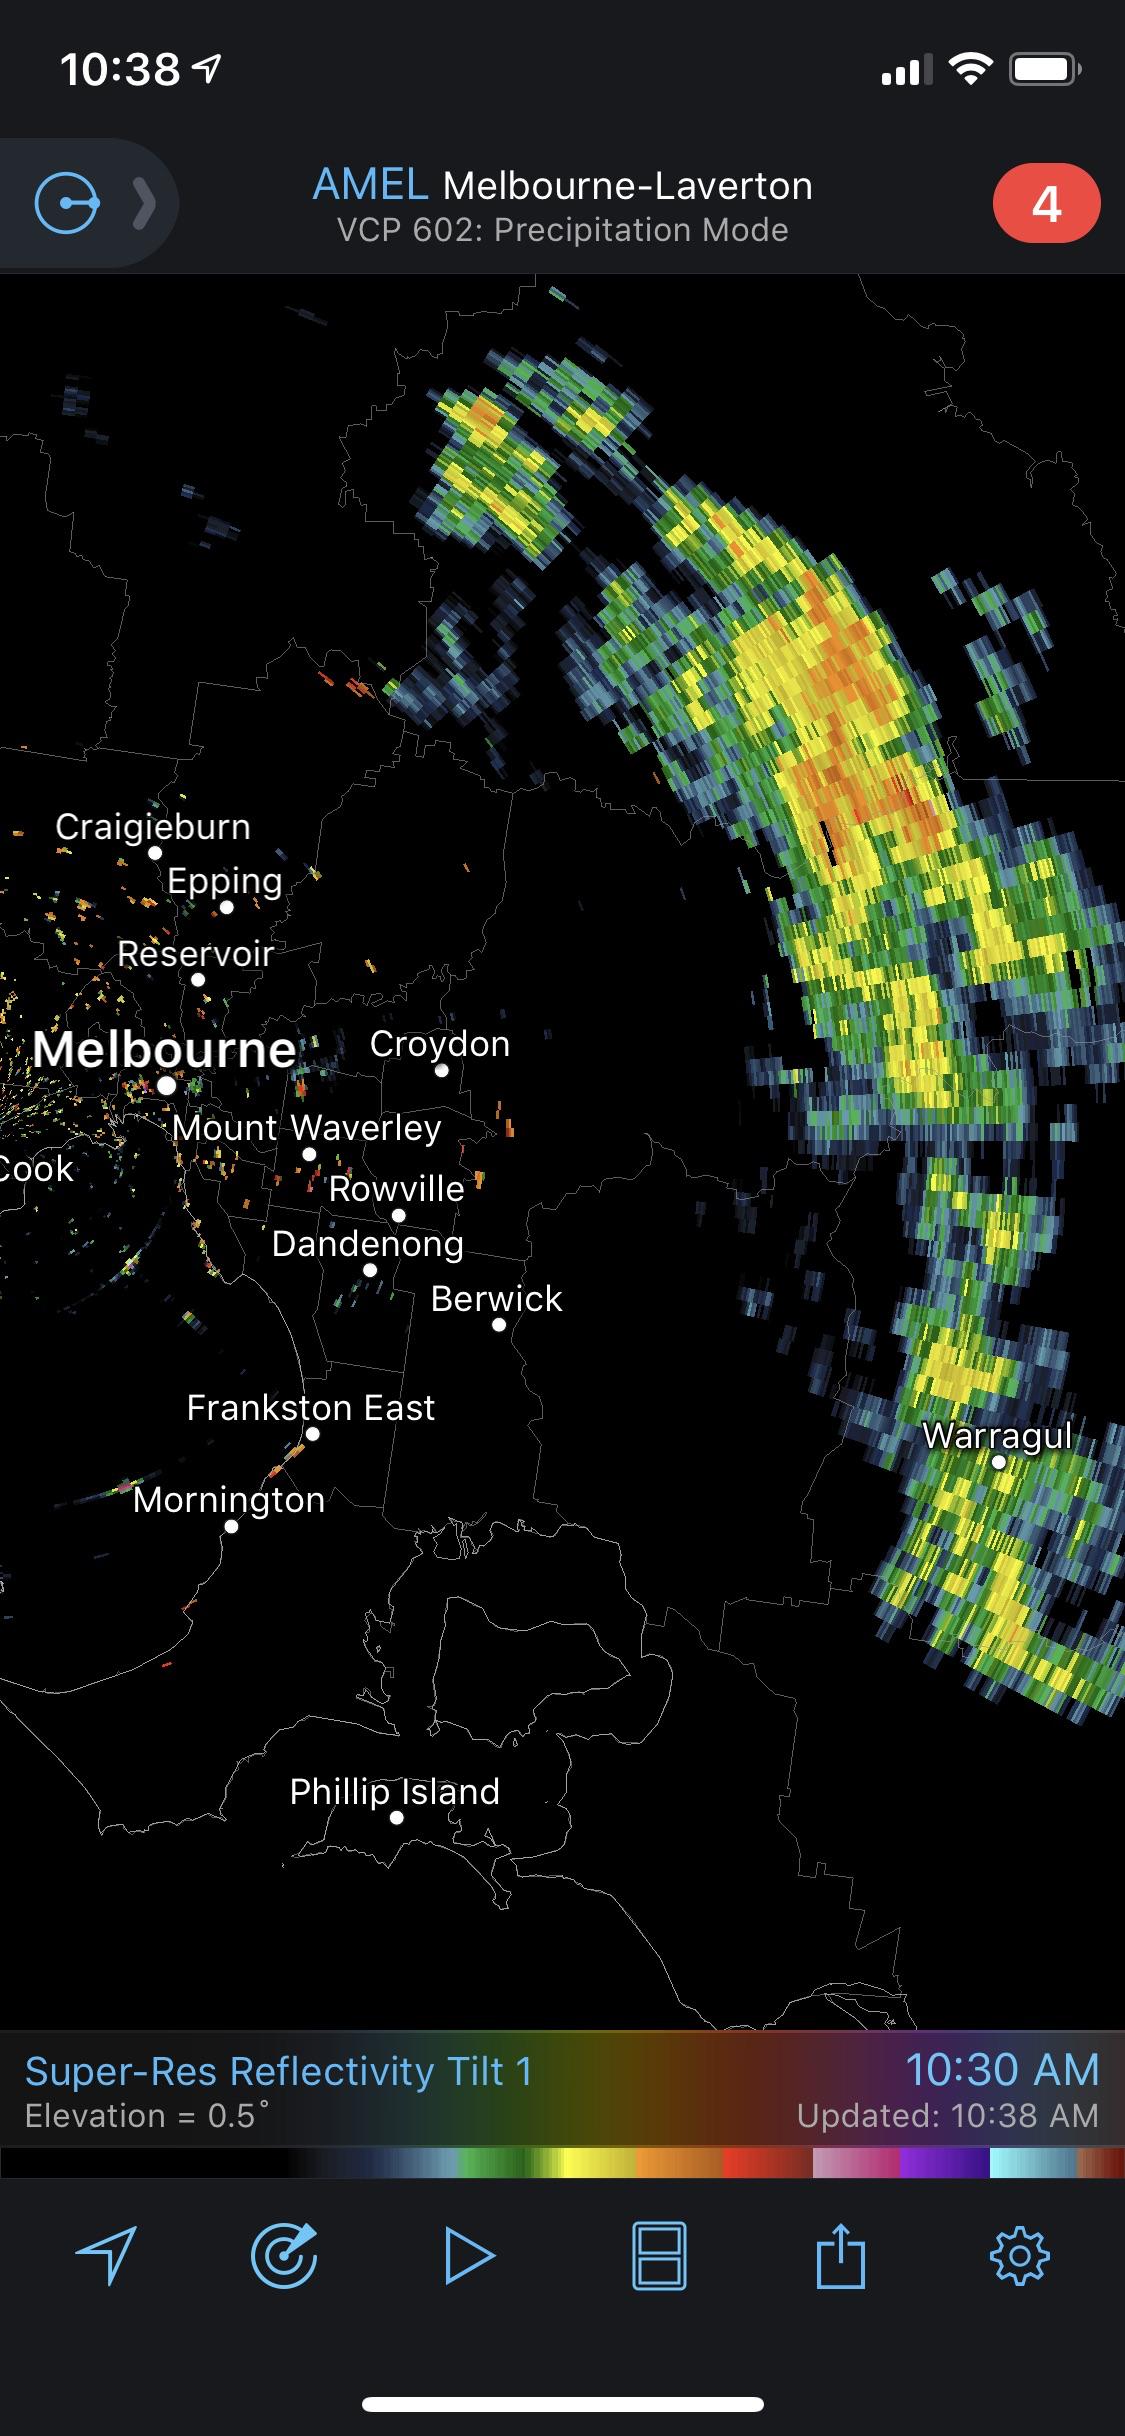 RadarScope Australia - Melbourne-Laverton Radar Precipitation Mode